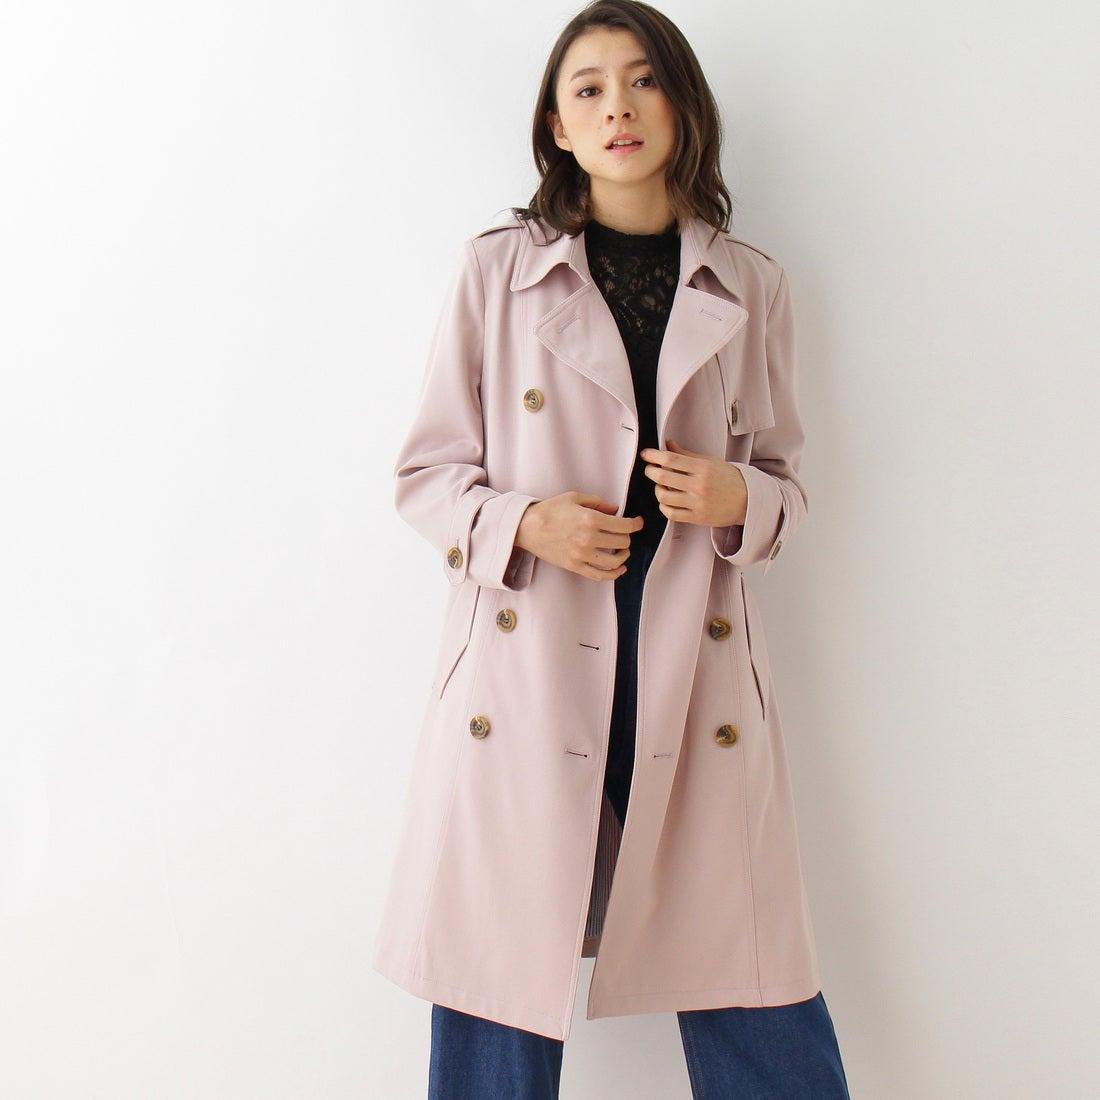 2750ddeb63b5d オゾック OZOC ベーシックトレンチ (ピンク) -靴&ファッション通販 ロコンド〜自宅で試着、気軽に返品